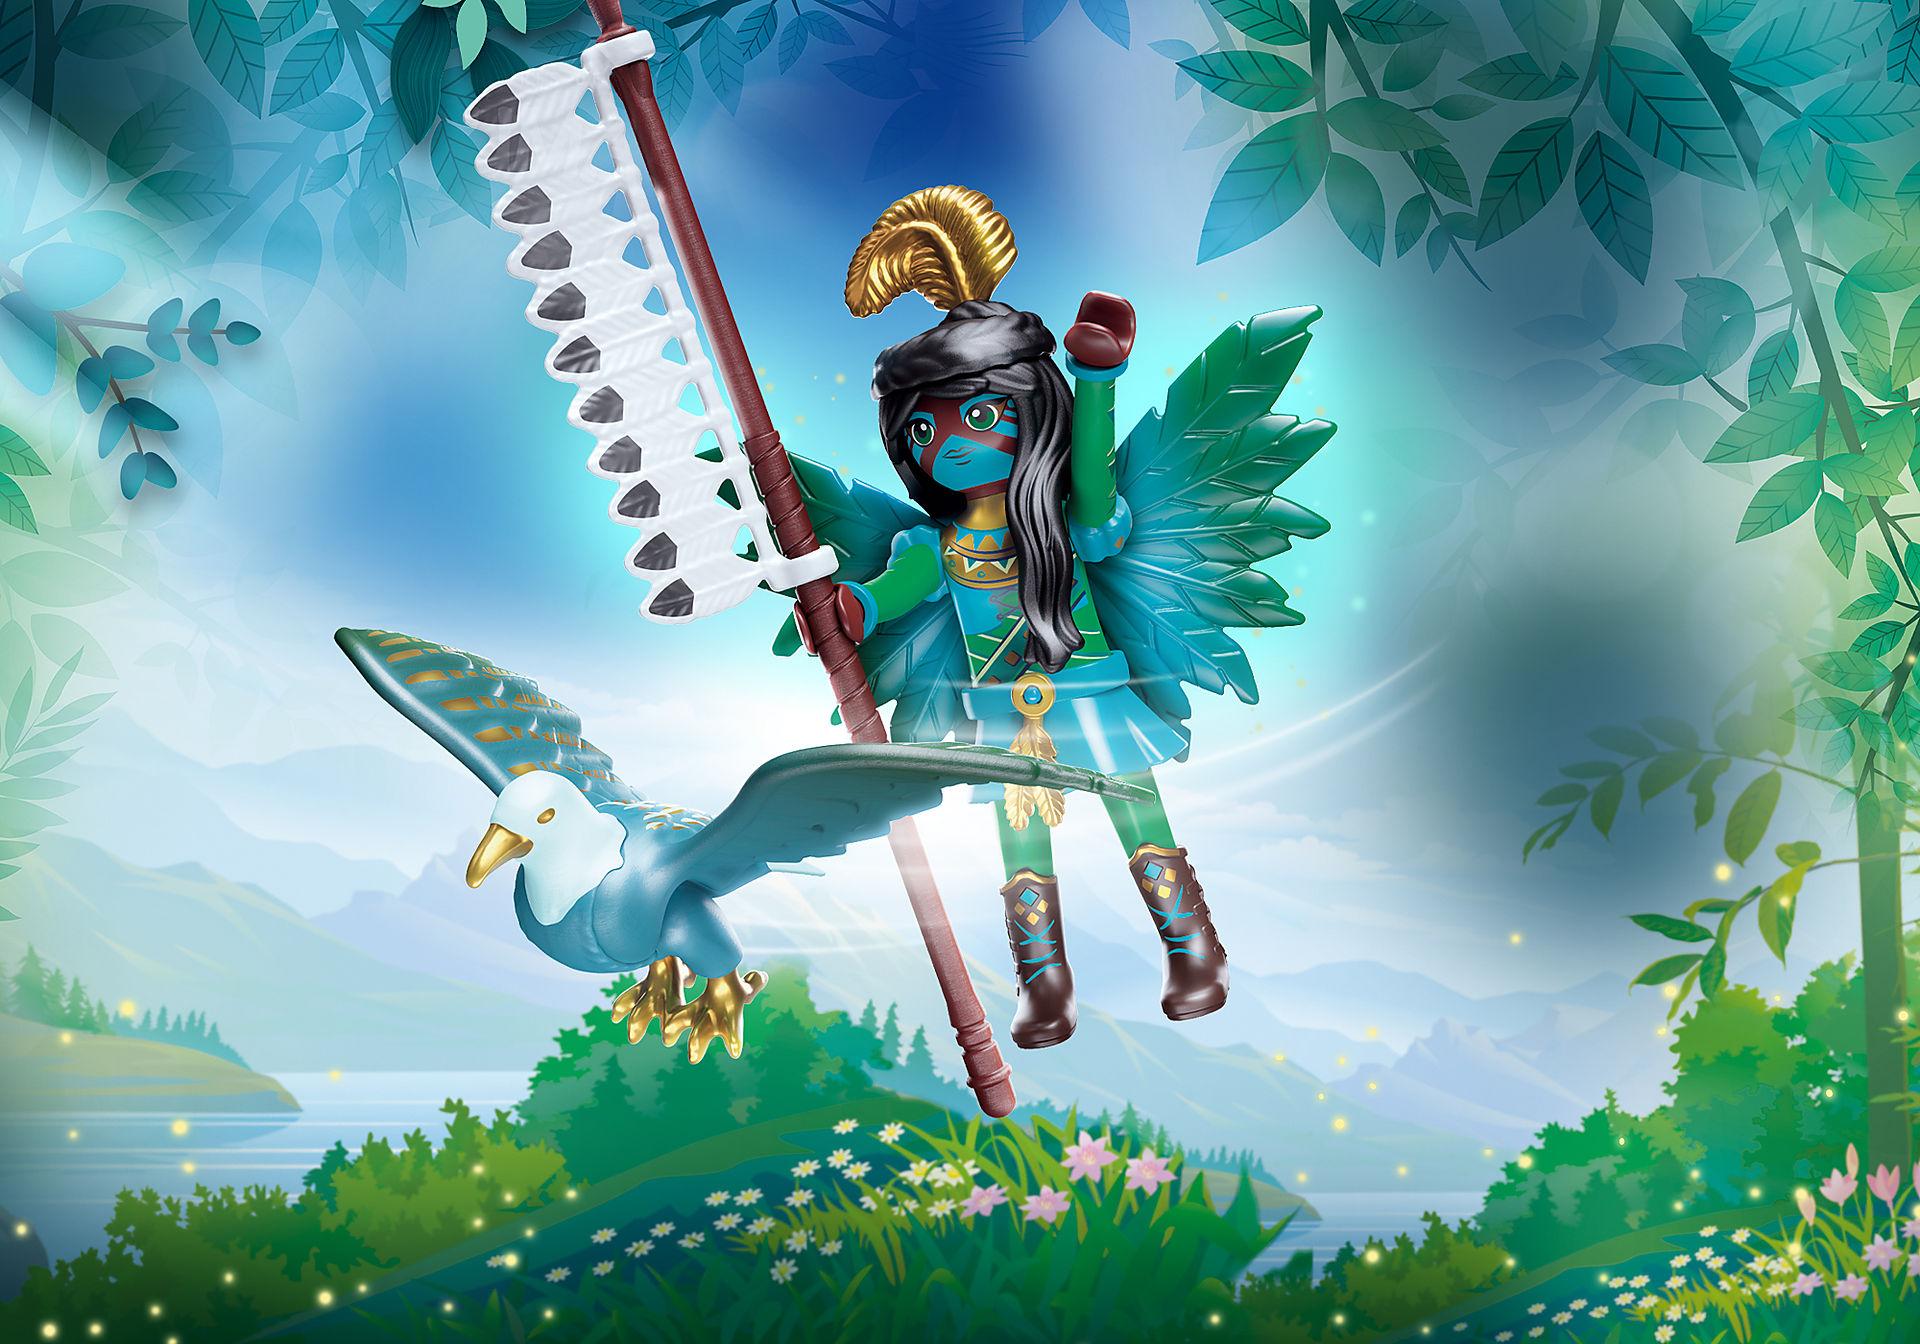 70802 Knight Fairy med totemdyr zoom image1